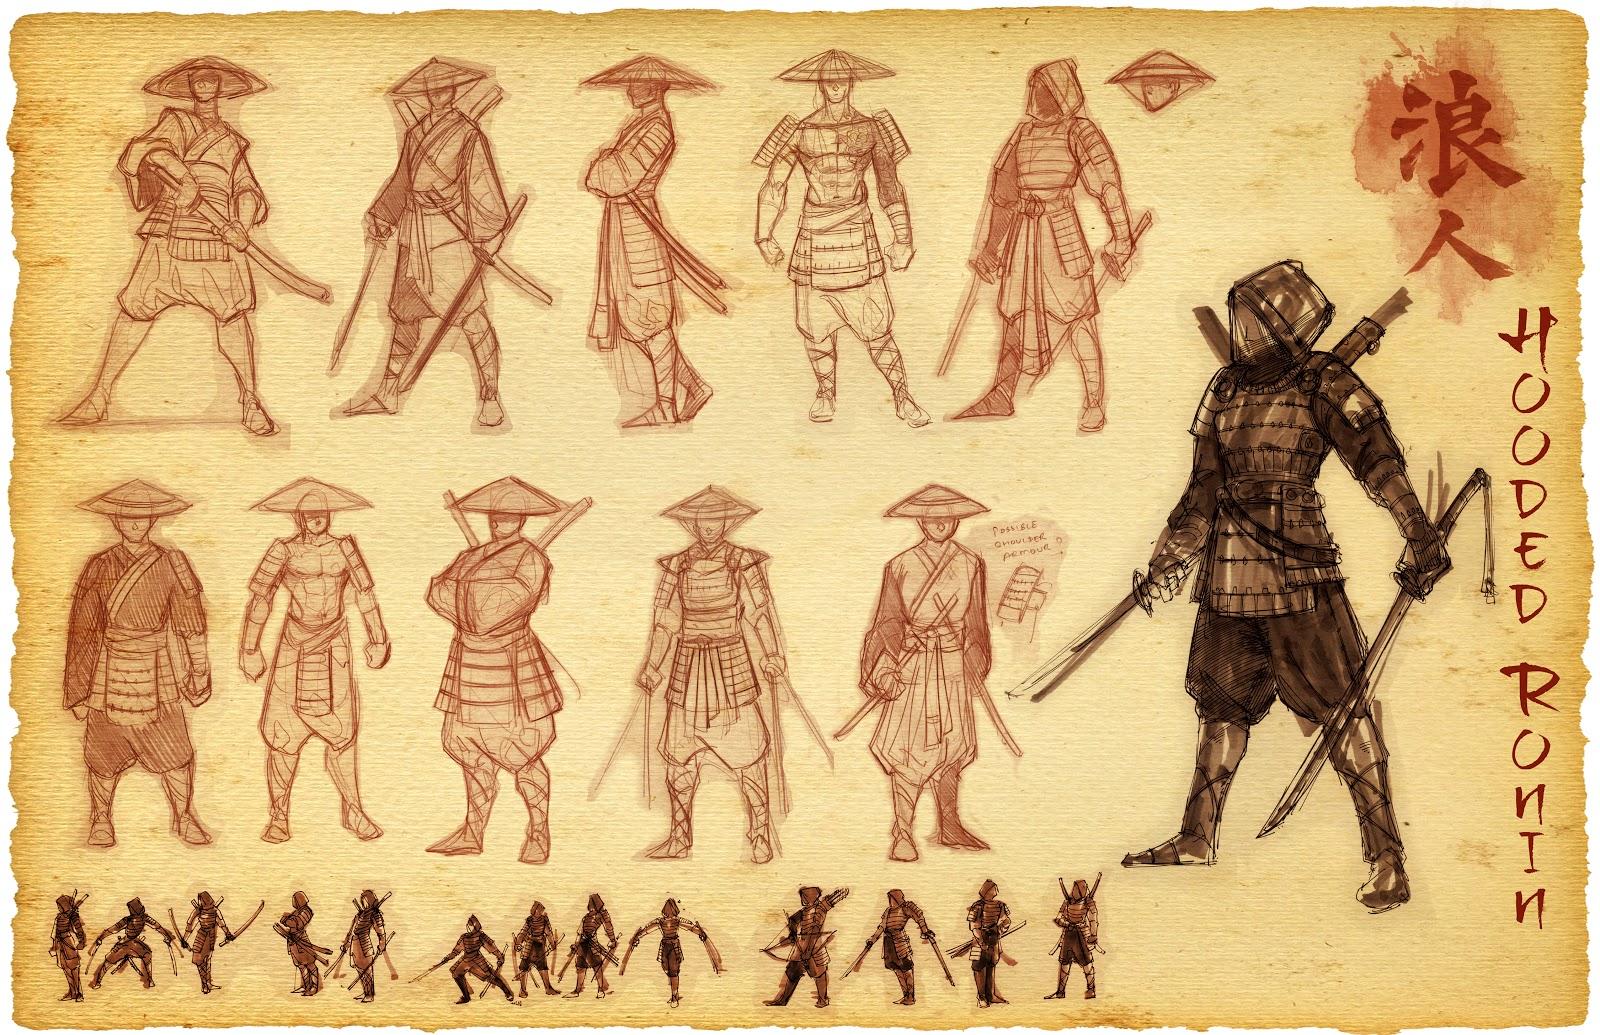 Drawn samurai hooded character ATOMIC Ronin Hooded Hooded Ronin